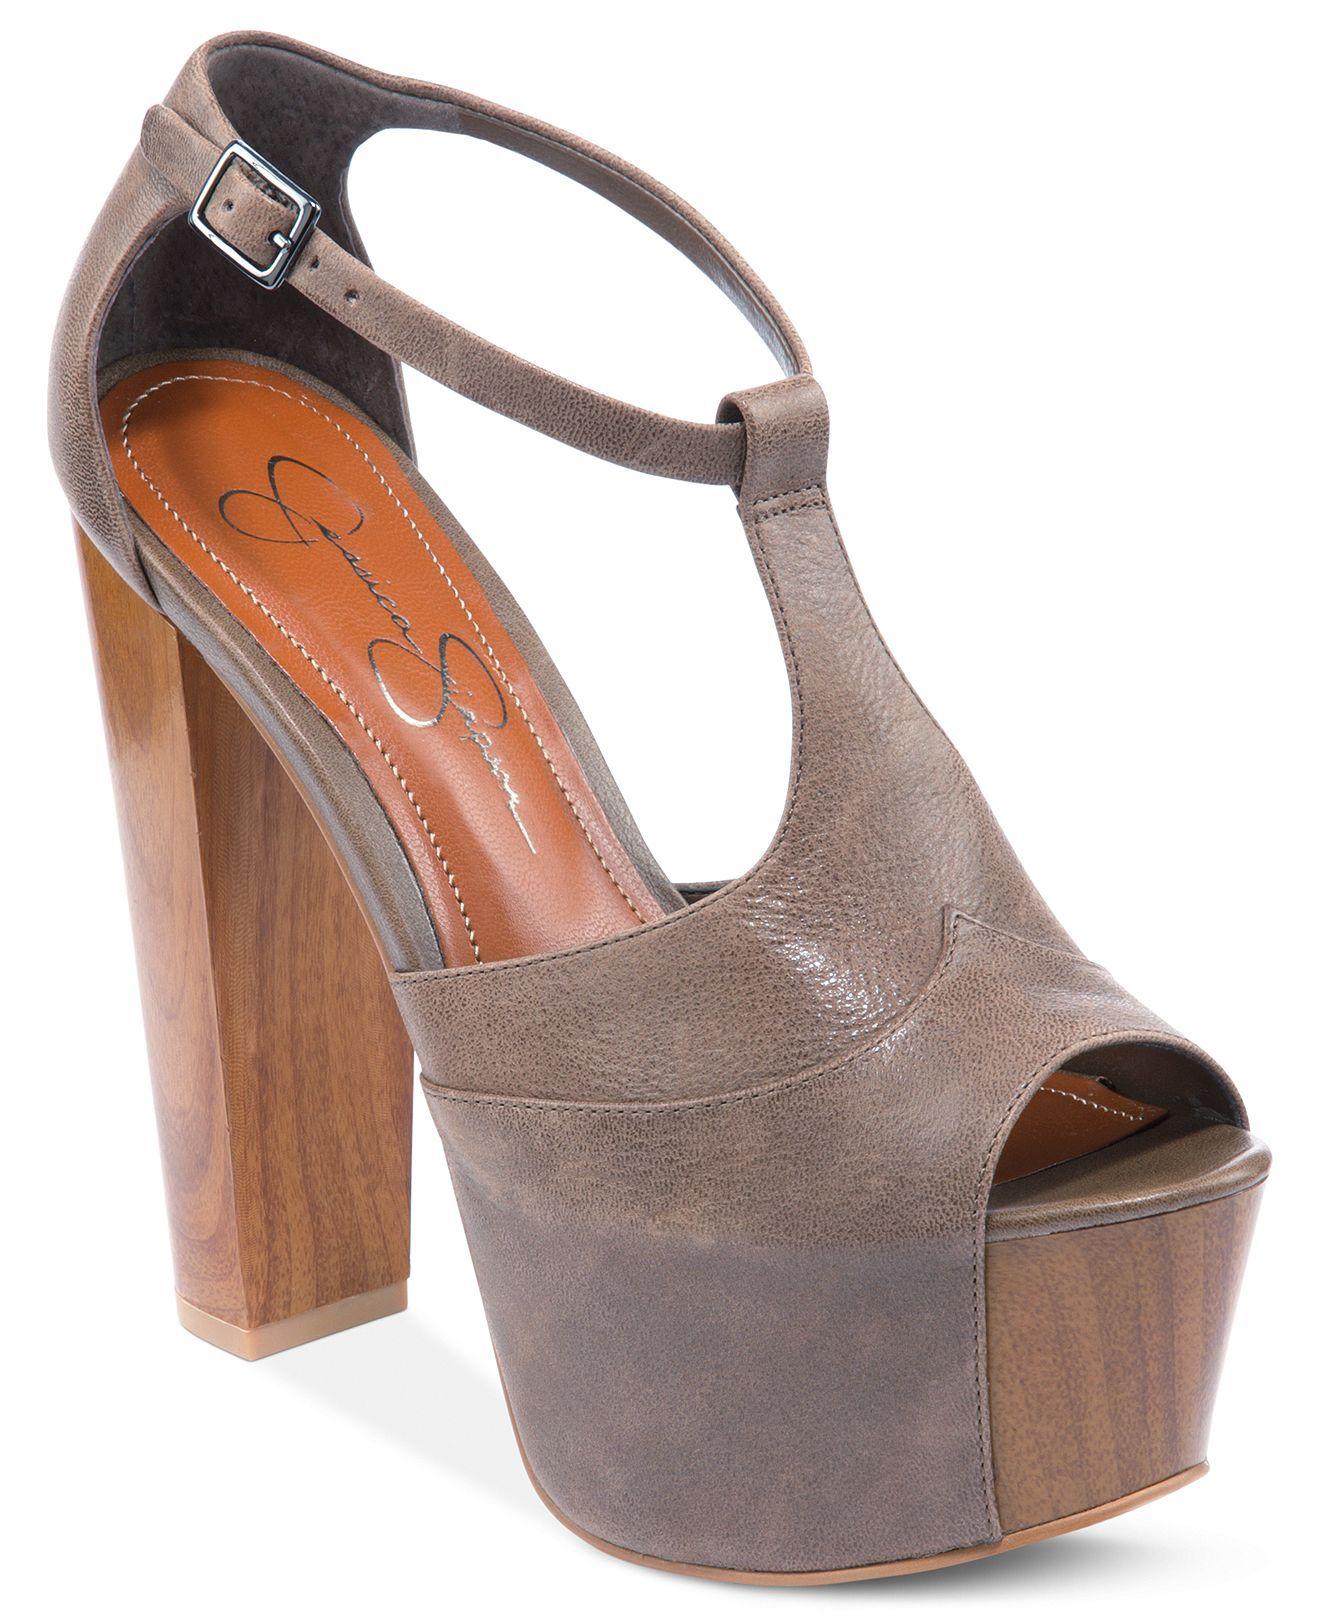 6c28f65679 Jessica Simpson Shoes, Dany Platform Sandals - Jessica Simpson - Shoes -  Macy's